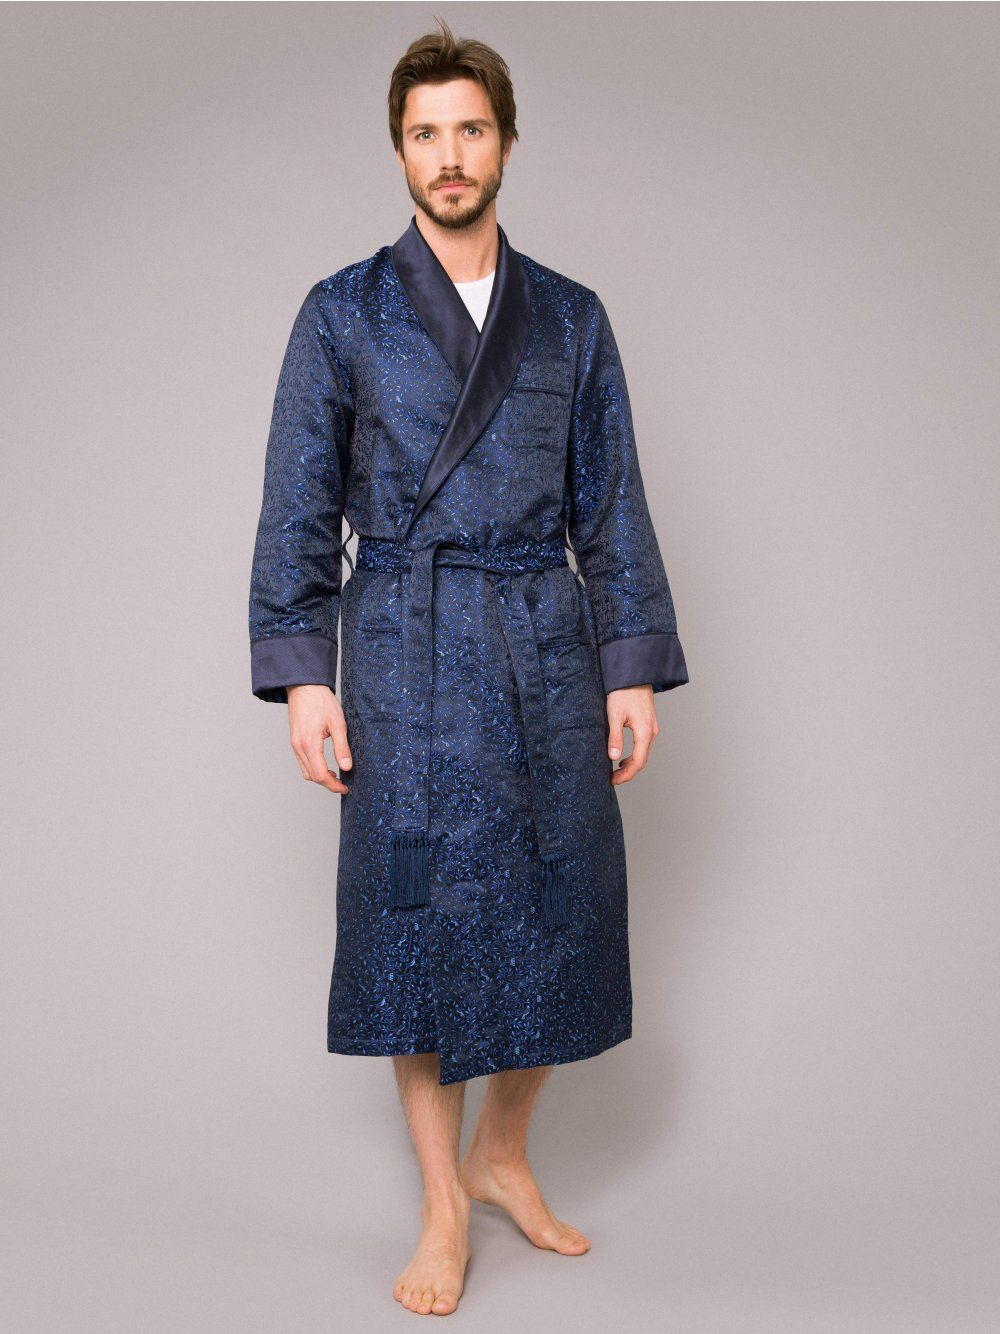 Mens Luxury Dressing Gown Verona Silk Blue Derek Rose Mens Dressing Gown Silk Dressing Gown Gowns Dresses